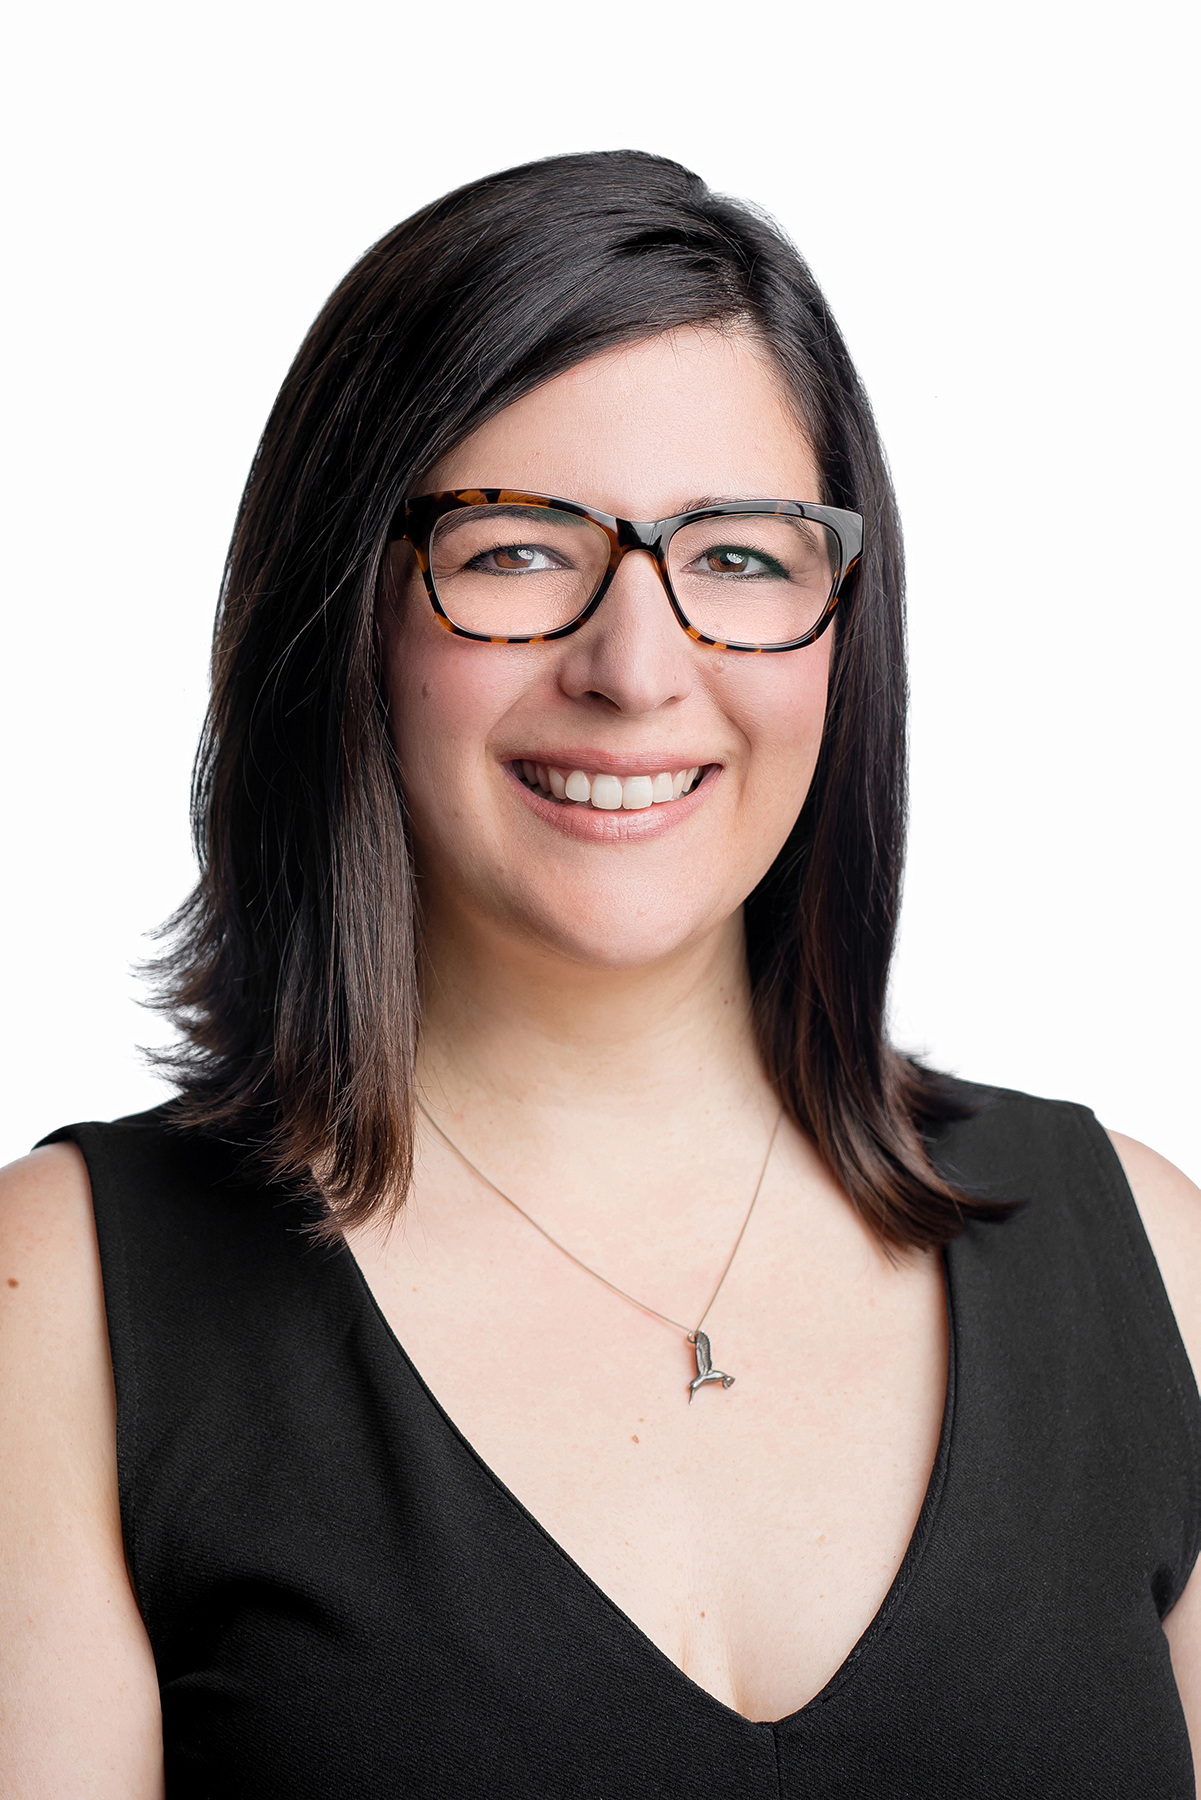 Genevieve Concannon